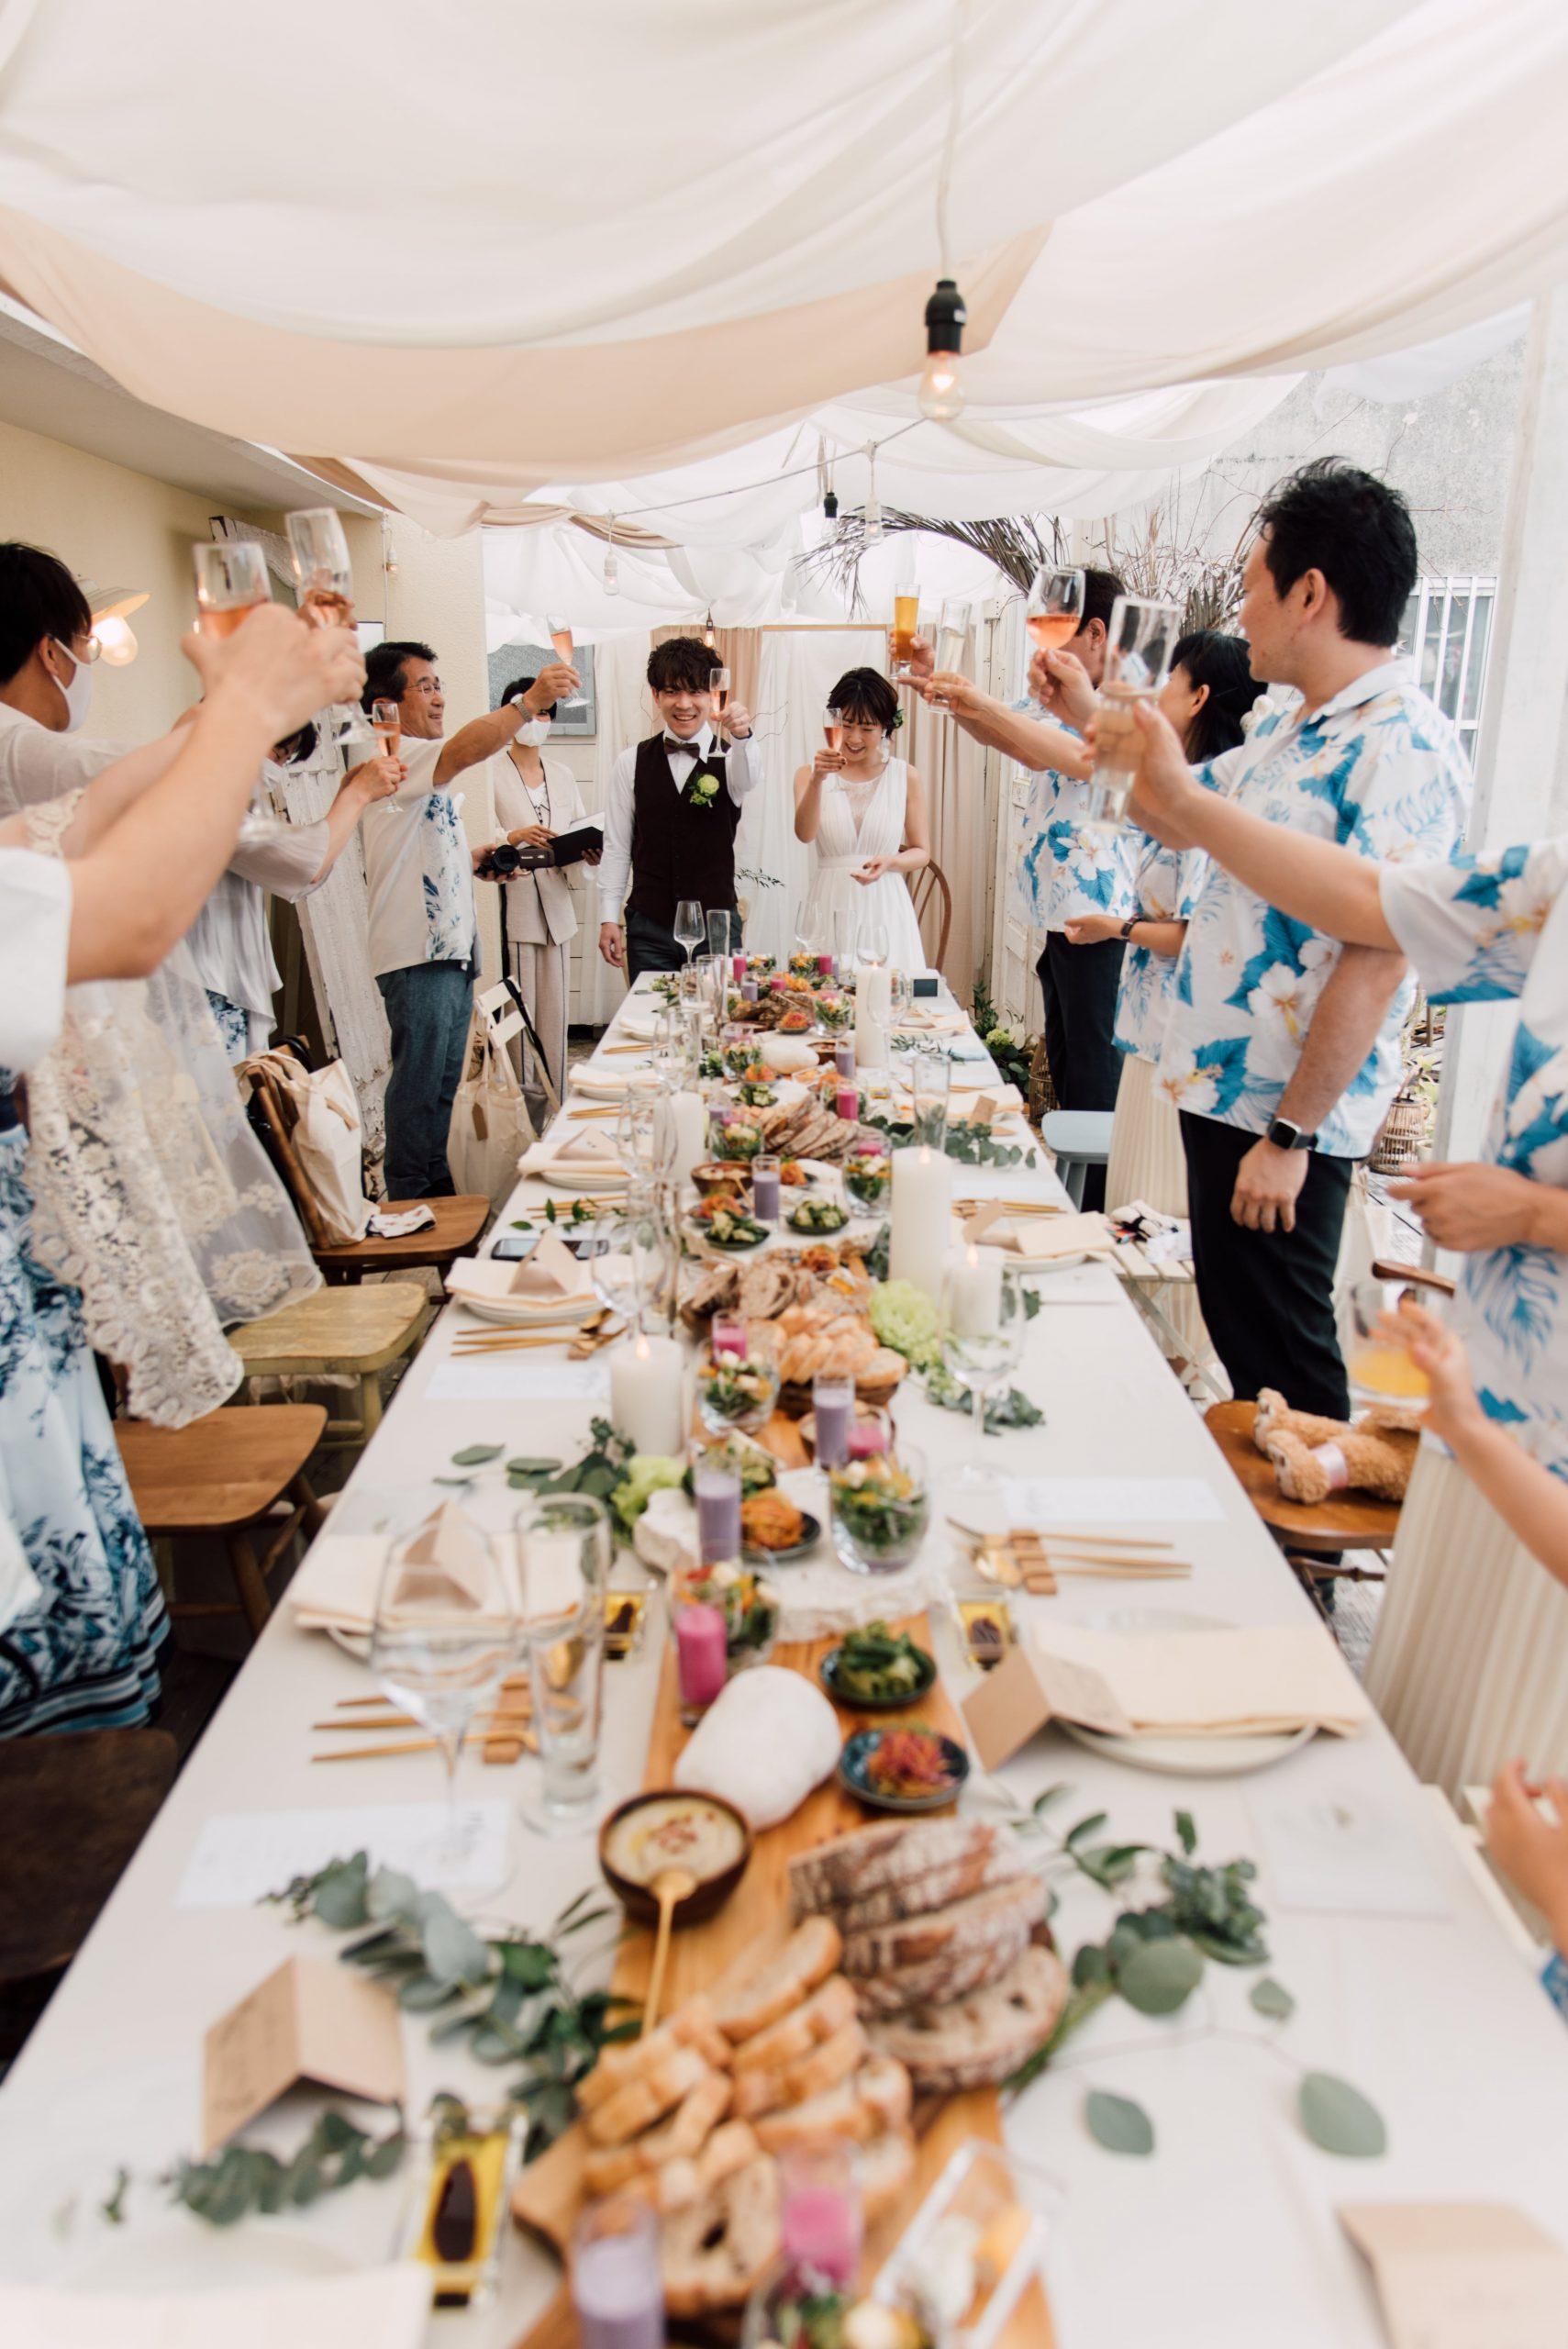 Le Passage aimer.okinawaでの小さな結婚式